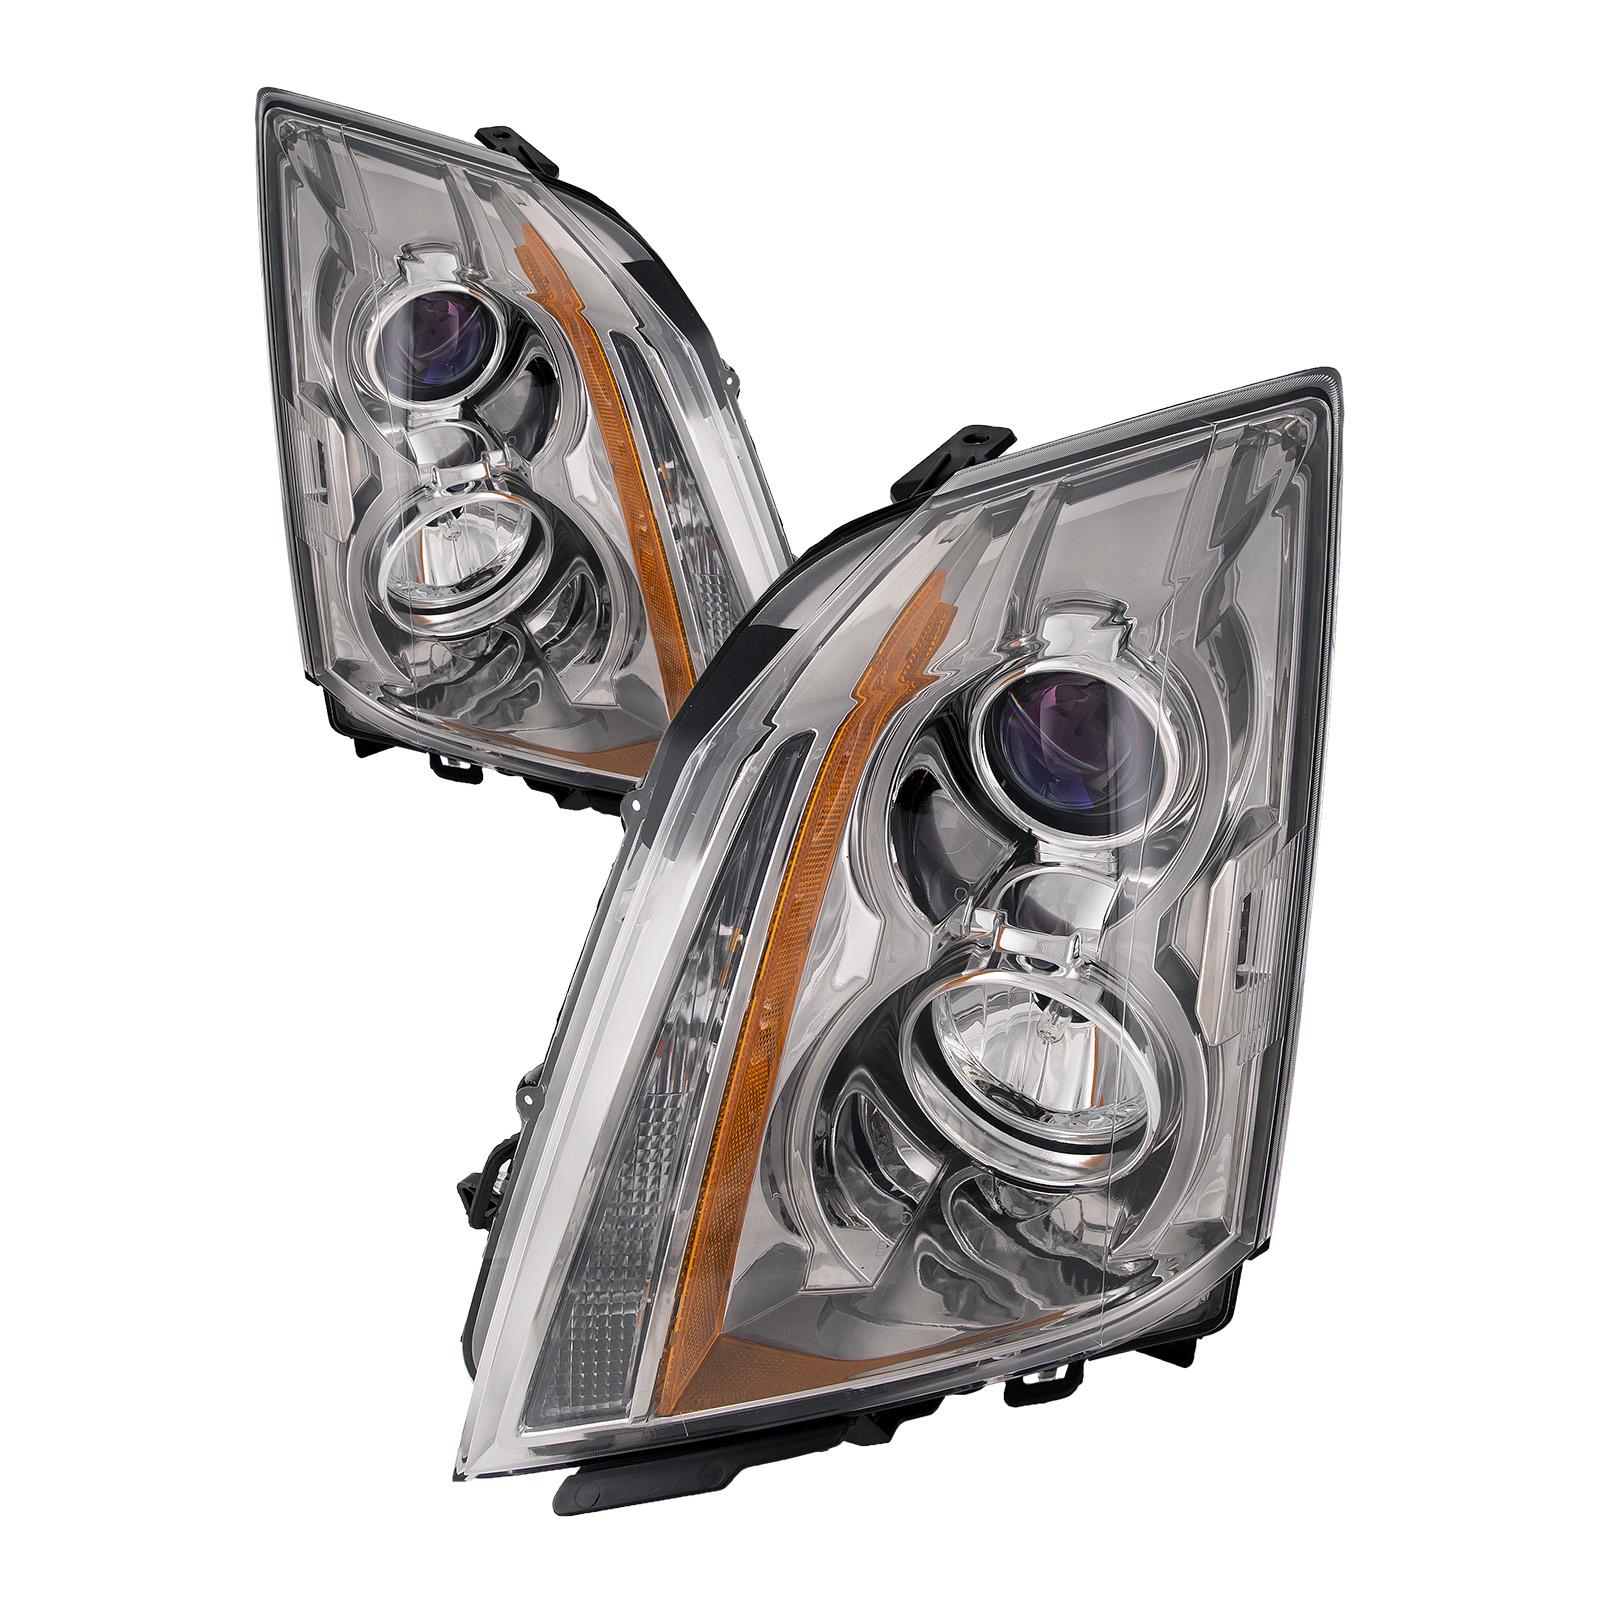 08-14 Cadillac Cts Sedan/11-15 Coupe Halogen Headlights